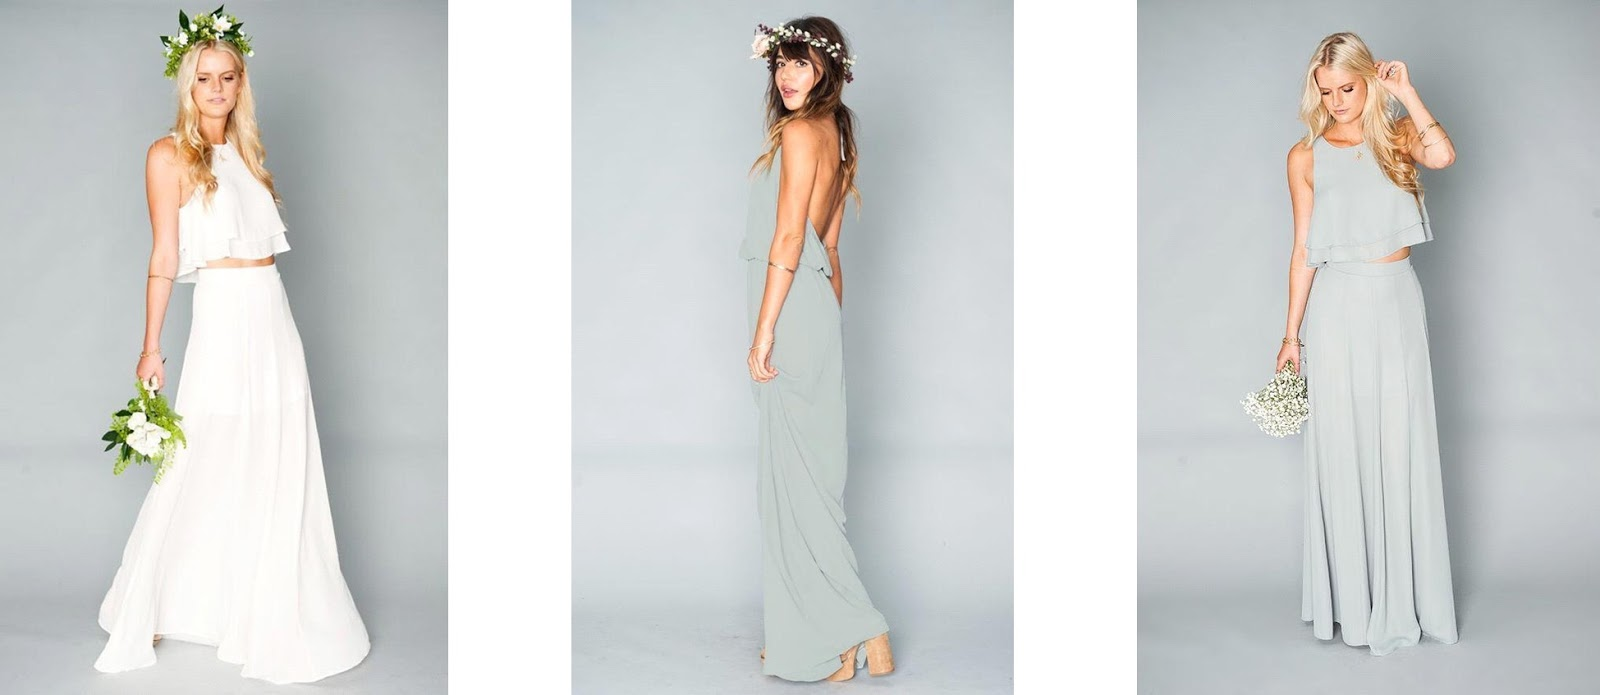 27dress, bridesmaid dress, classy boho long bridesmaid dress chiffon designer, 27dresses,